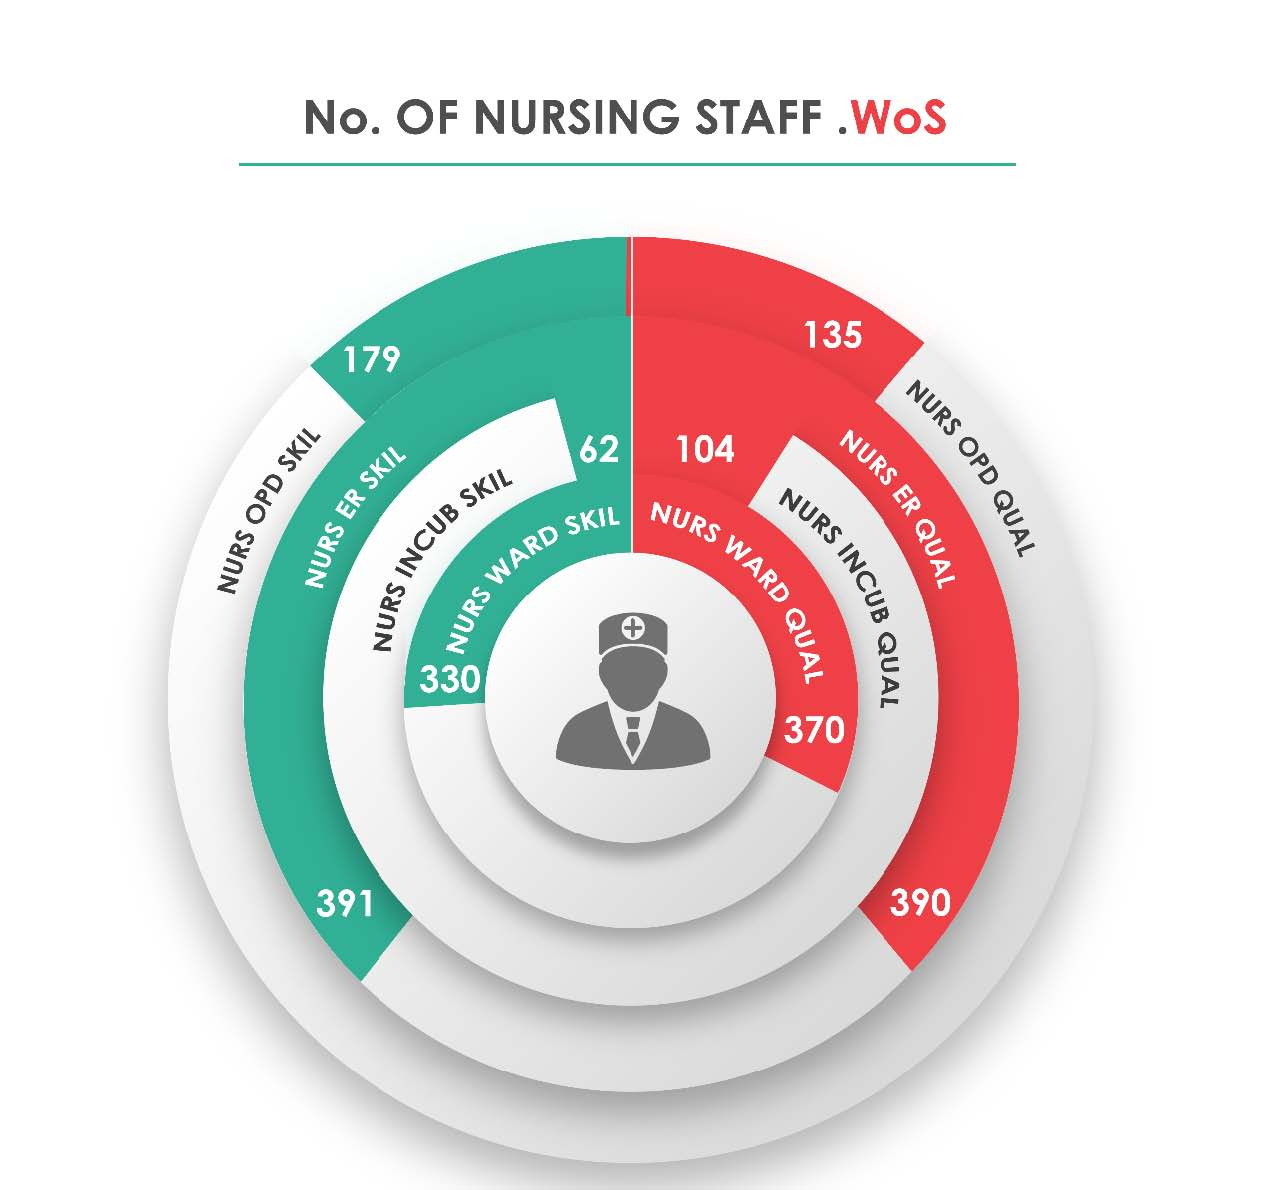 Fig._27.0_Human_Resources_Nursing_Staff__Whole_of_Syria.jpg